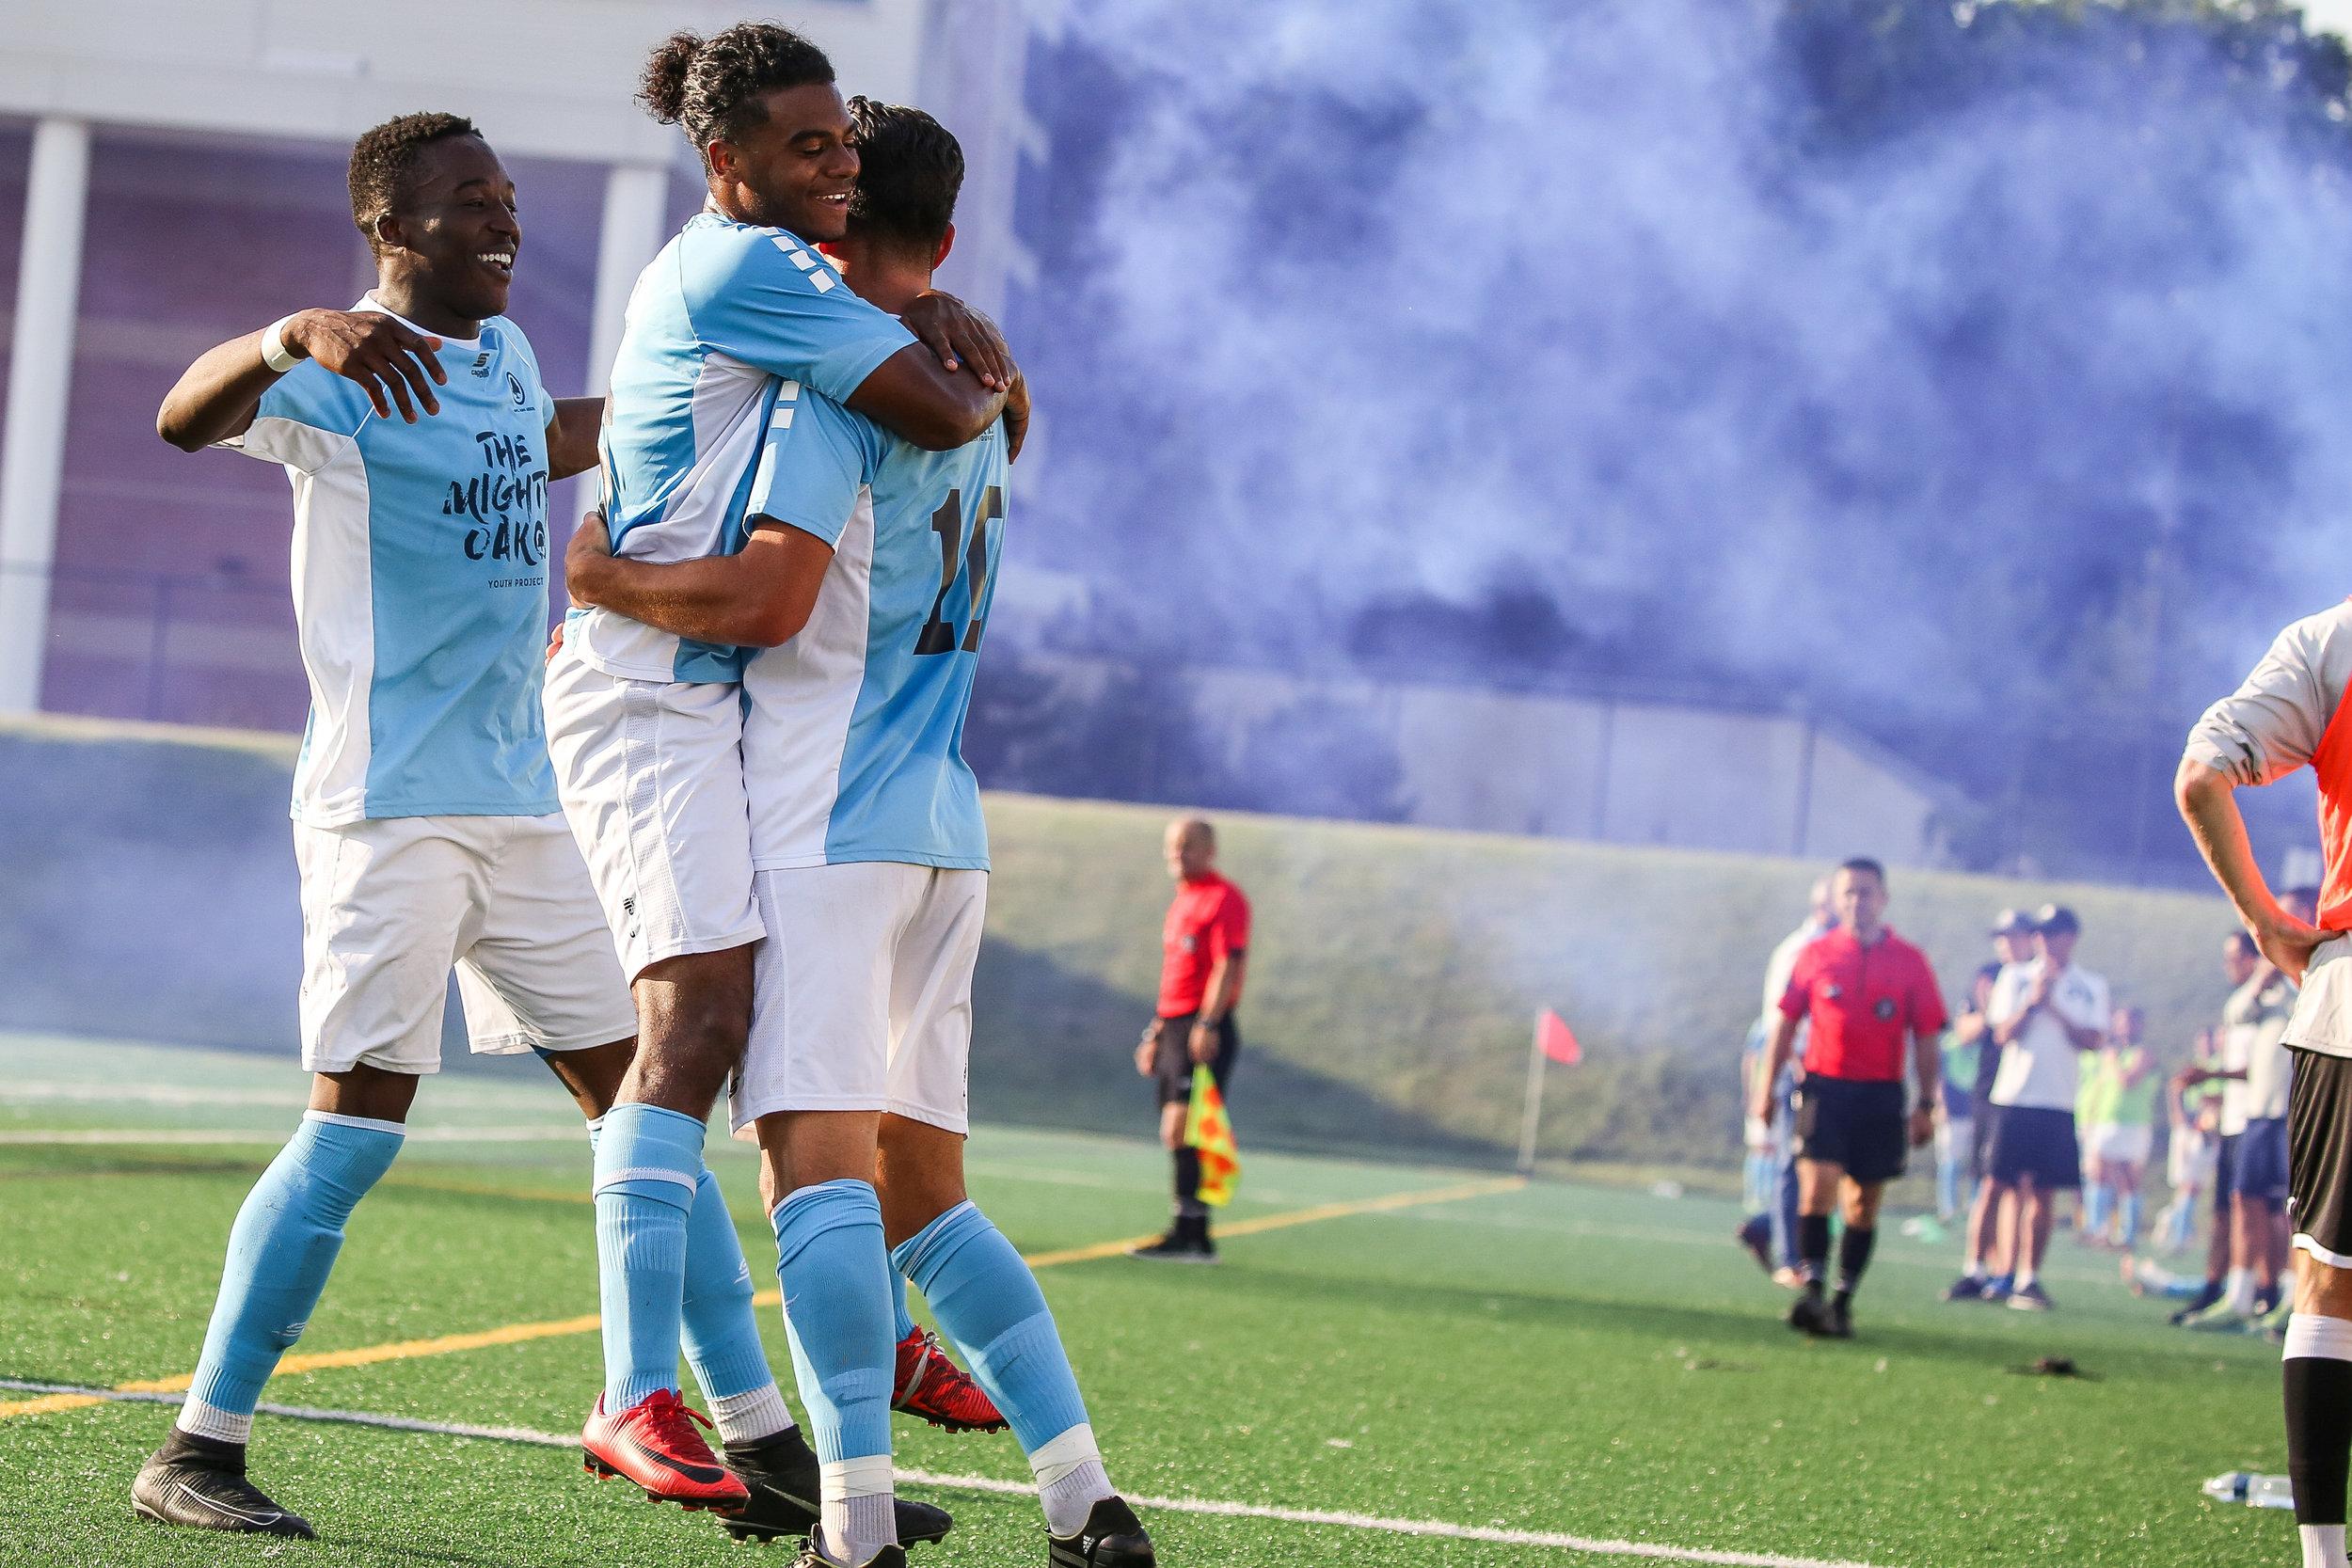 AFC vs KZoo-20180615-17.jpg